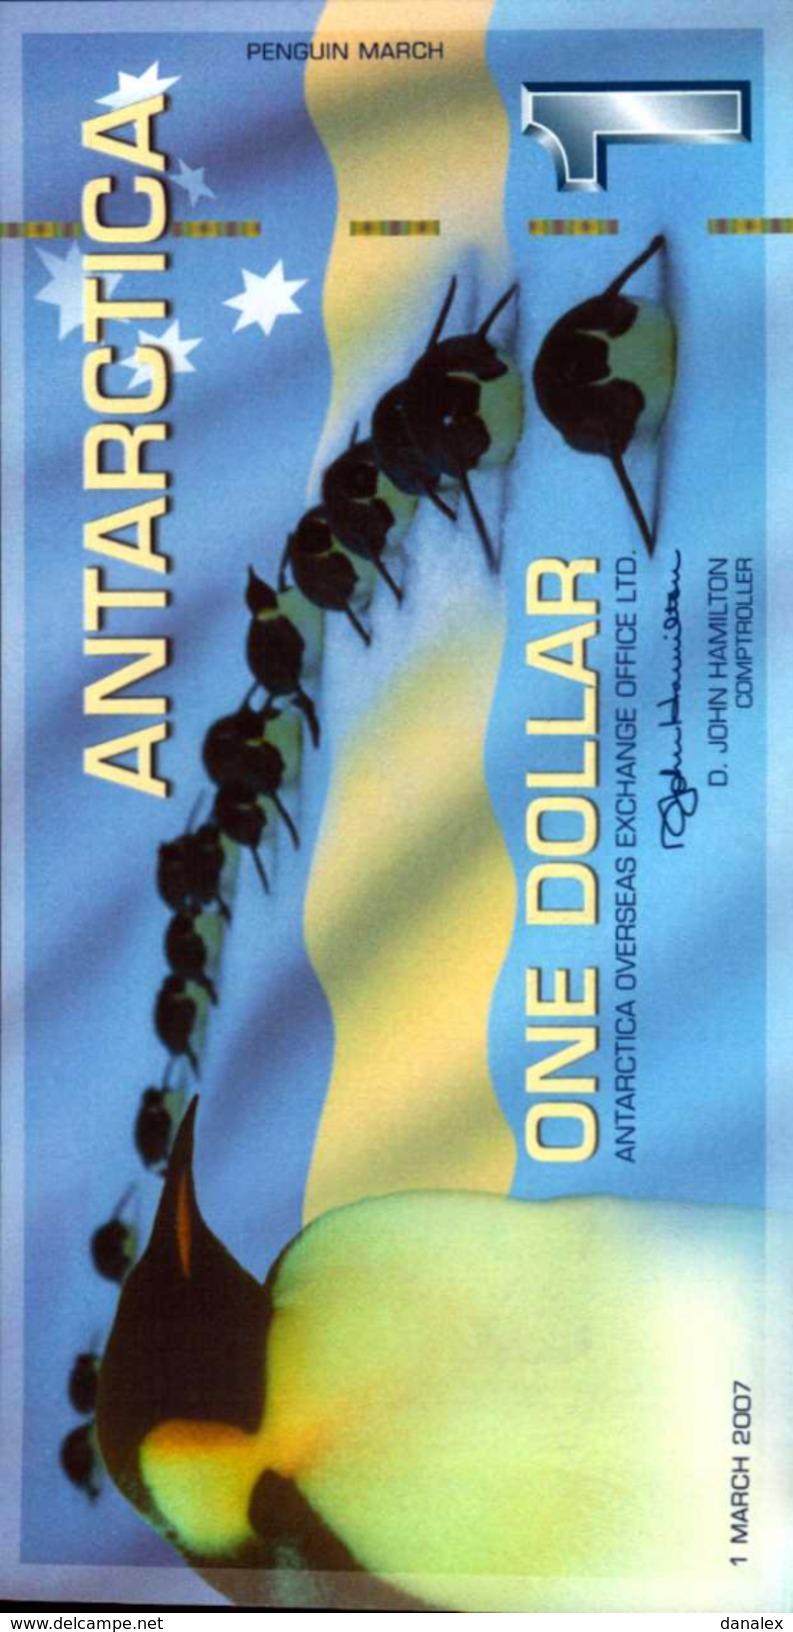 ANTARTIQUE 1 DOLLAR Du 1-3-2007  UNC/NEUF - Non Classés